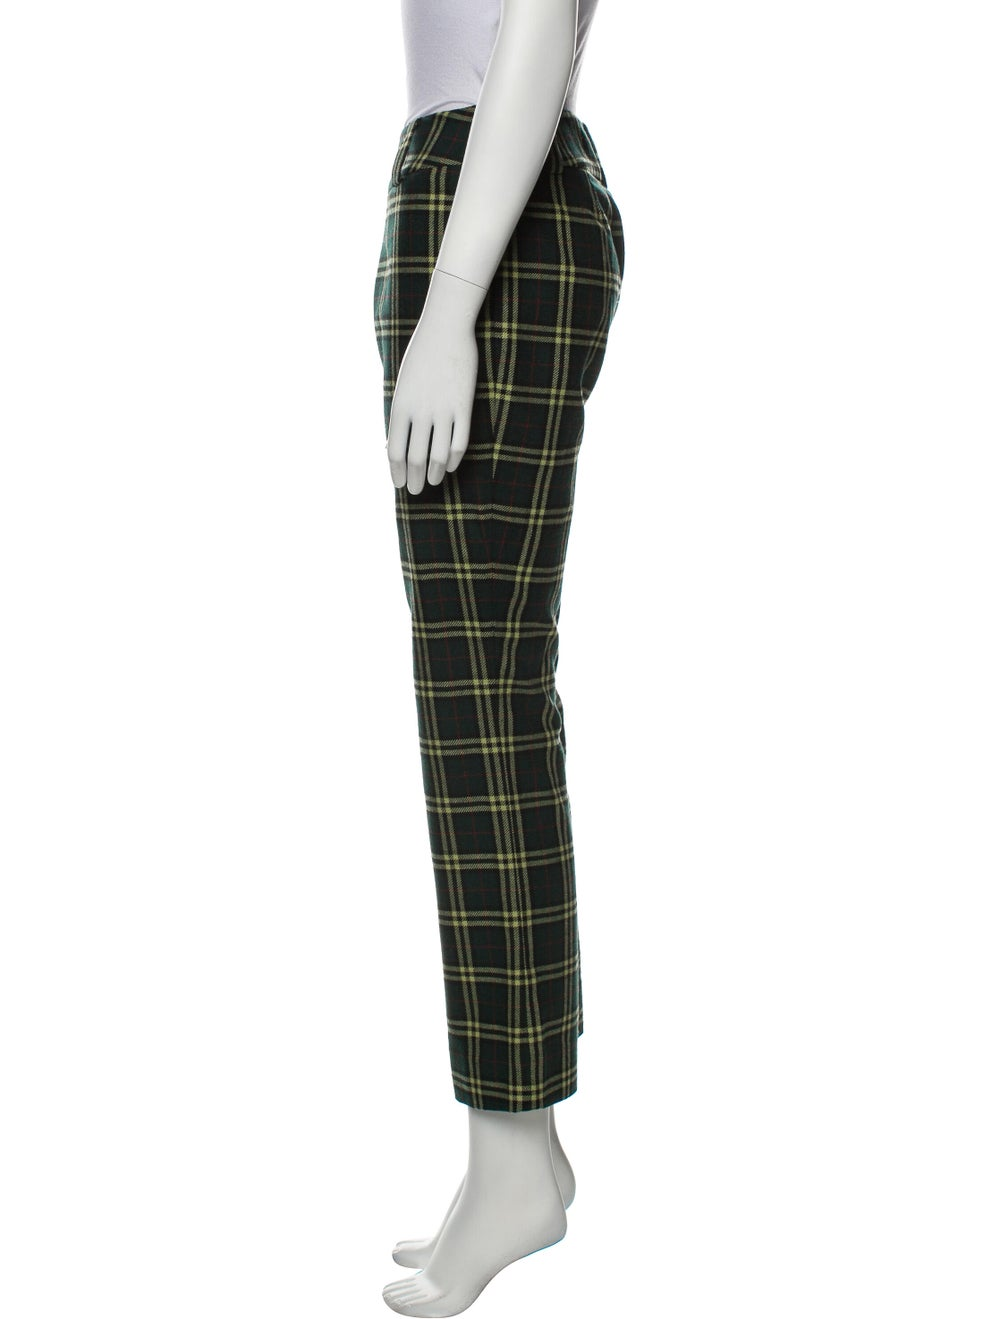 D&G Plaid Print Straight Leg Pants Green - image 2